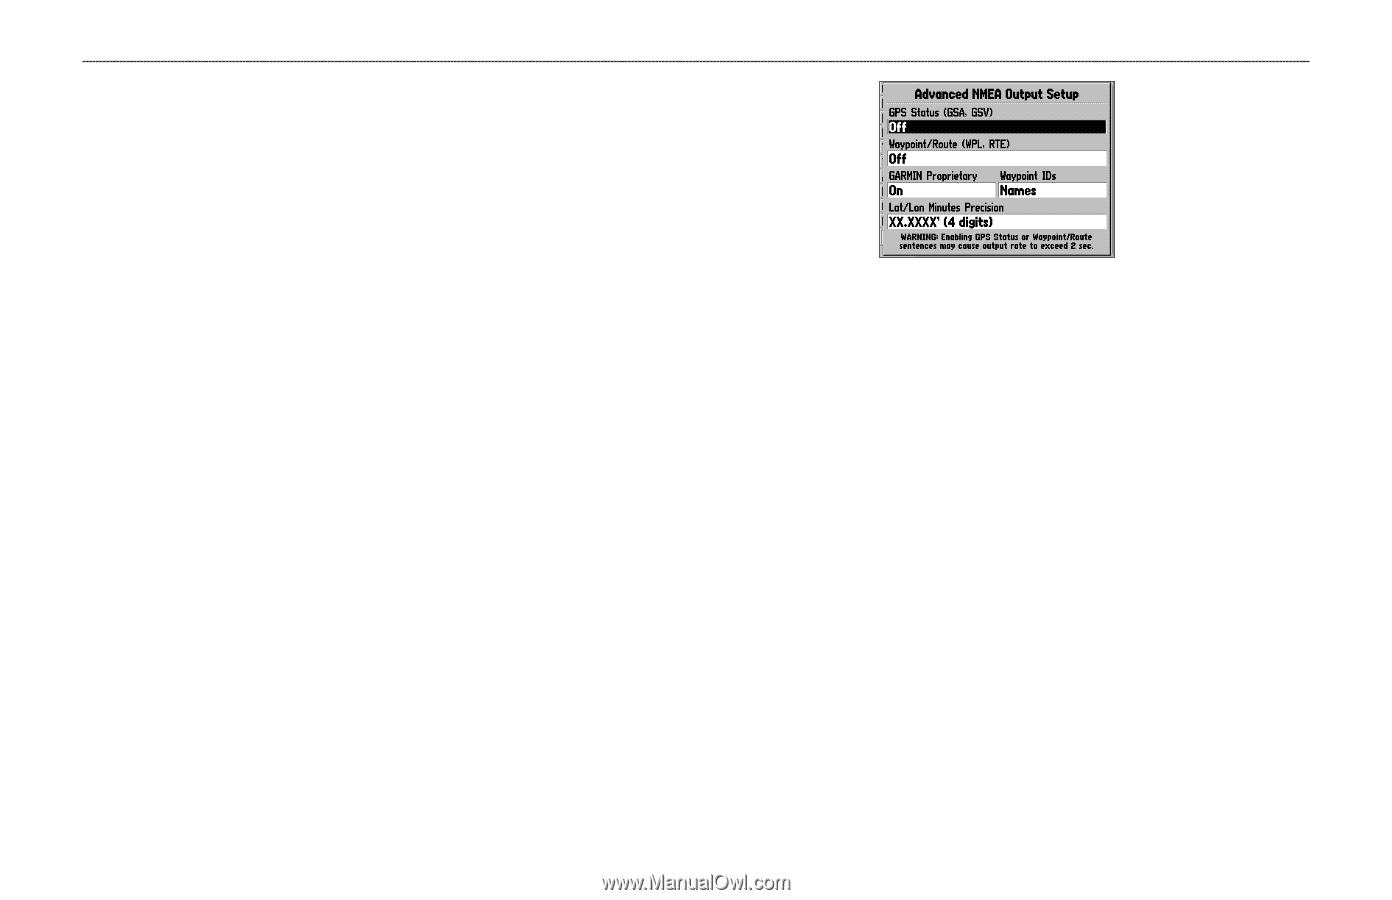 Garmin 496 Gps Wiring Diagram. . Wiring Diagram on